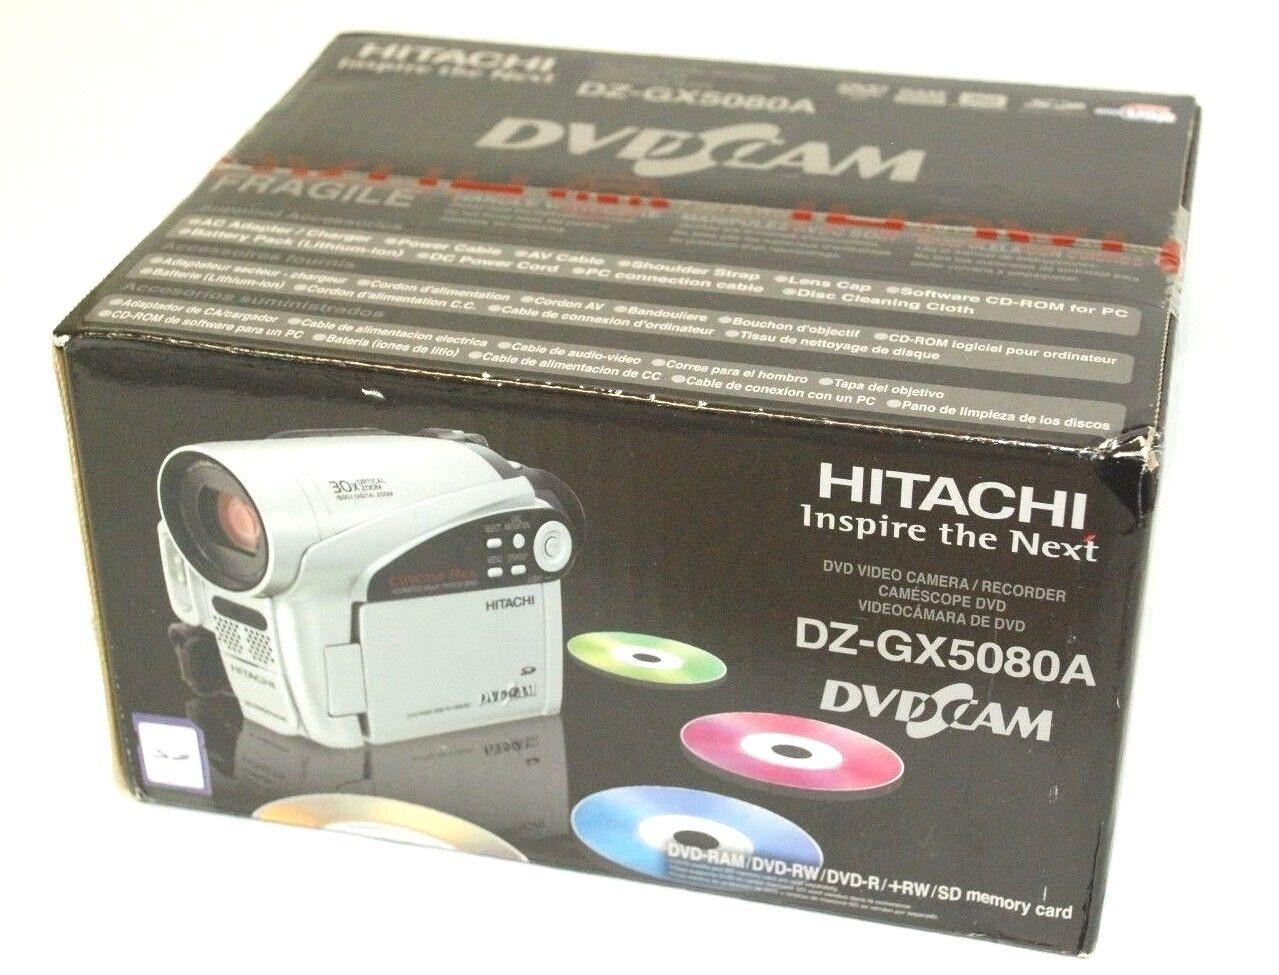 hitachi dz gx5080a dvd camcorder ebay rh ebay com Hitachi TV Repair Manual Hitachi TV Service Manual